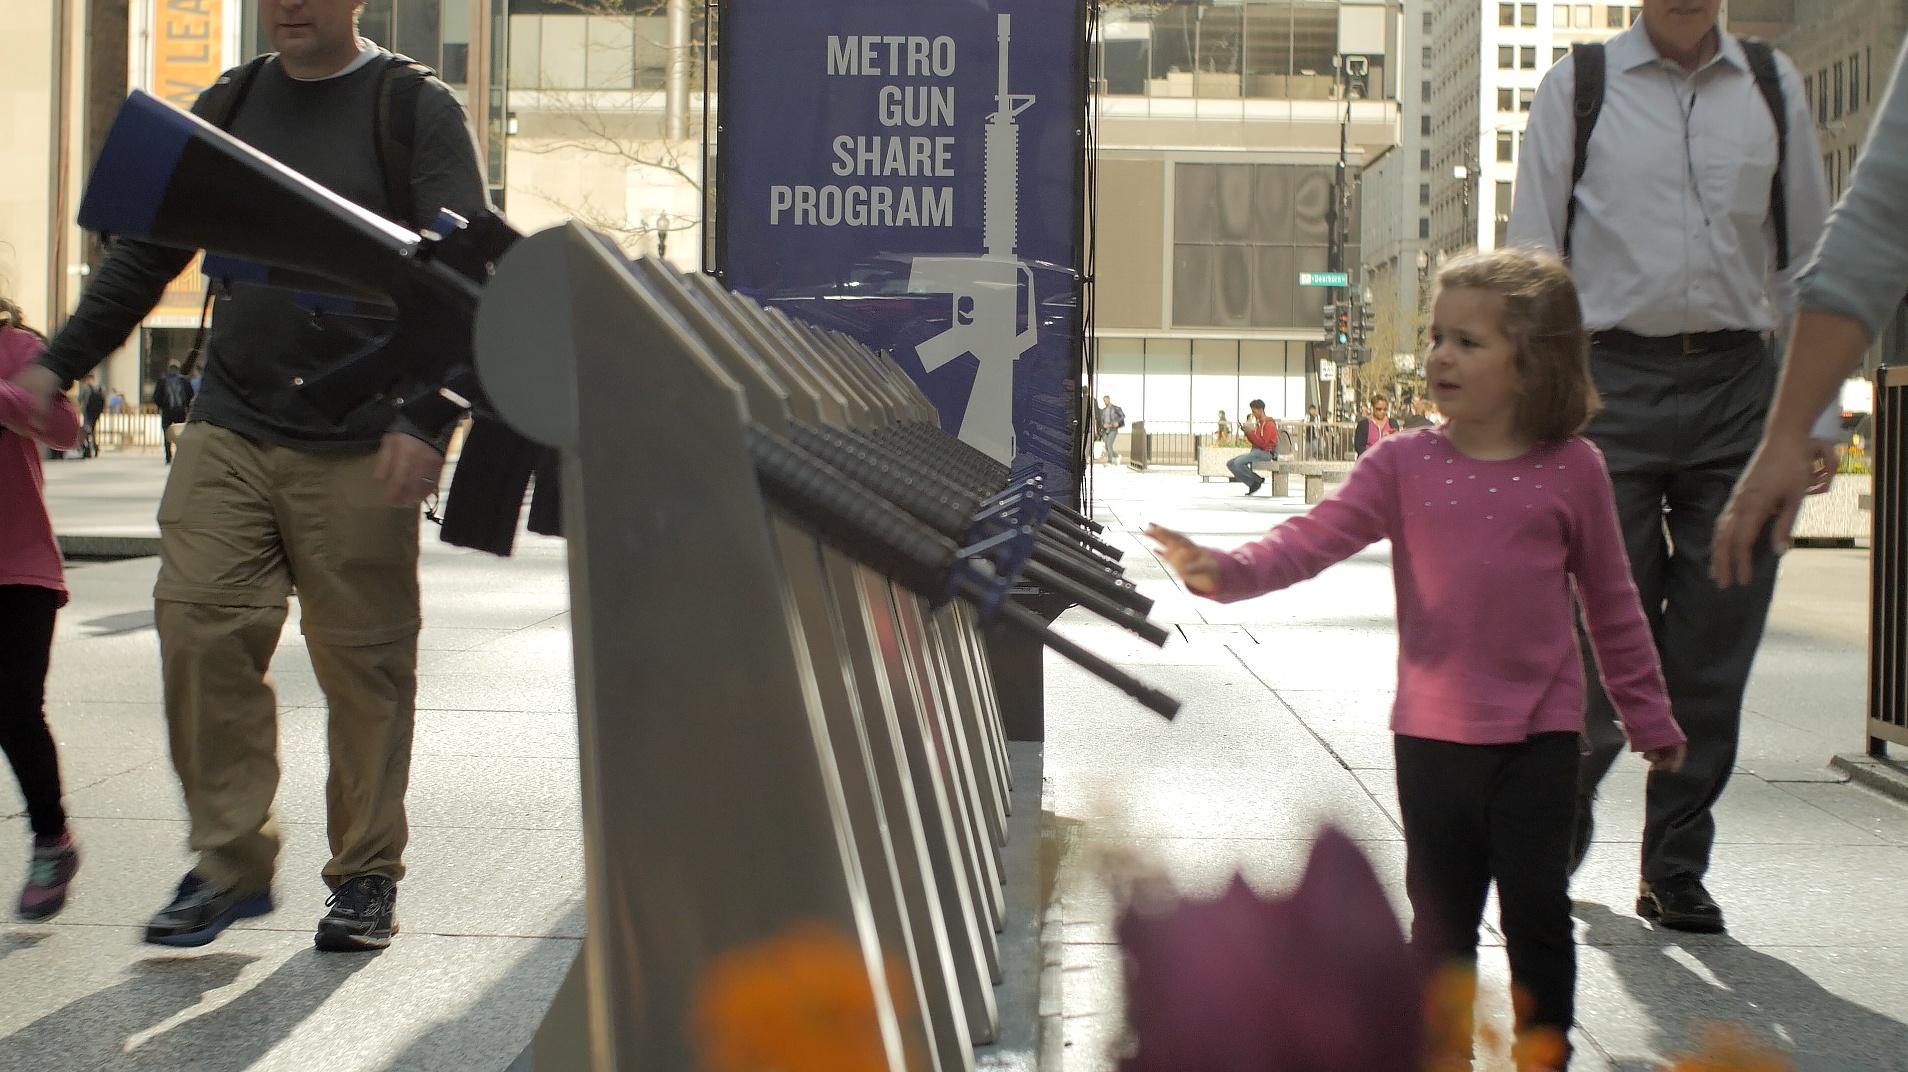 Thumbnail for Metro Gun Share Installation